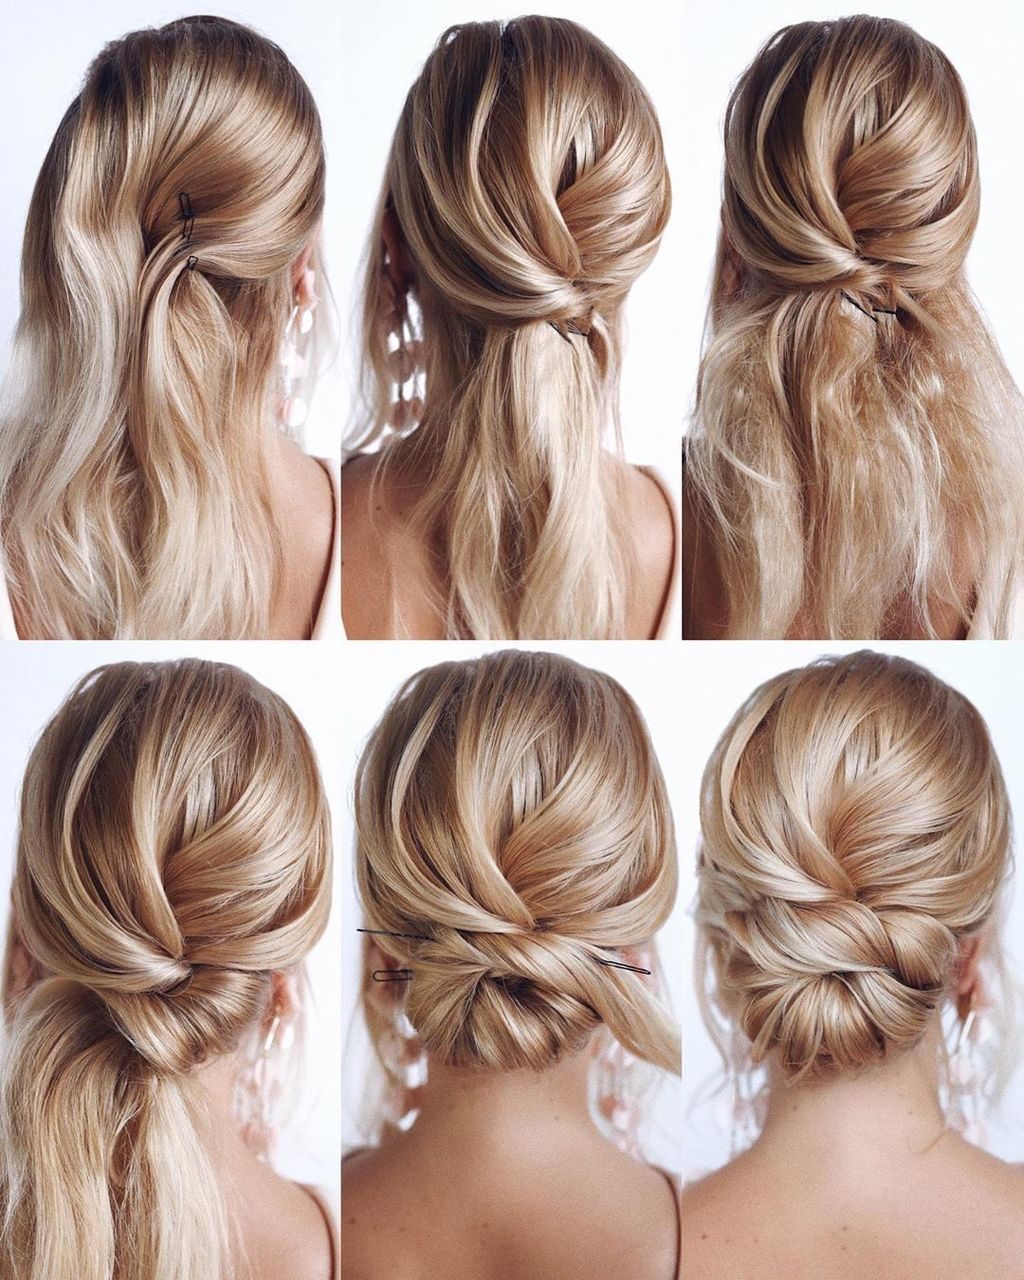 12+ Best Wedding Hairstyles Ideas For Medium Length Hair   Easy ...